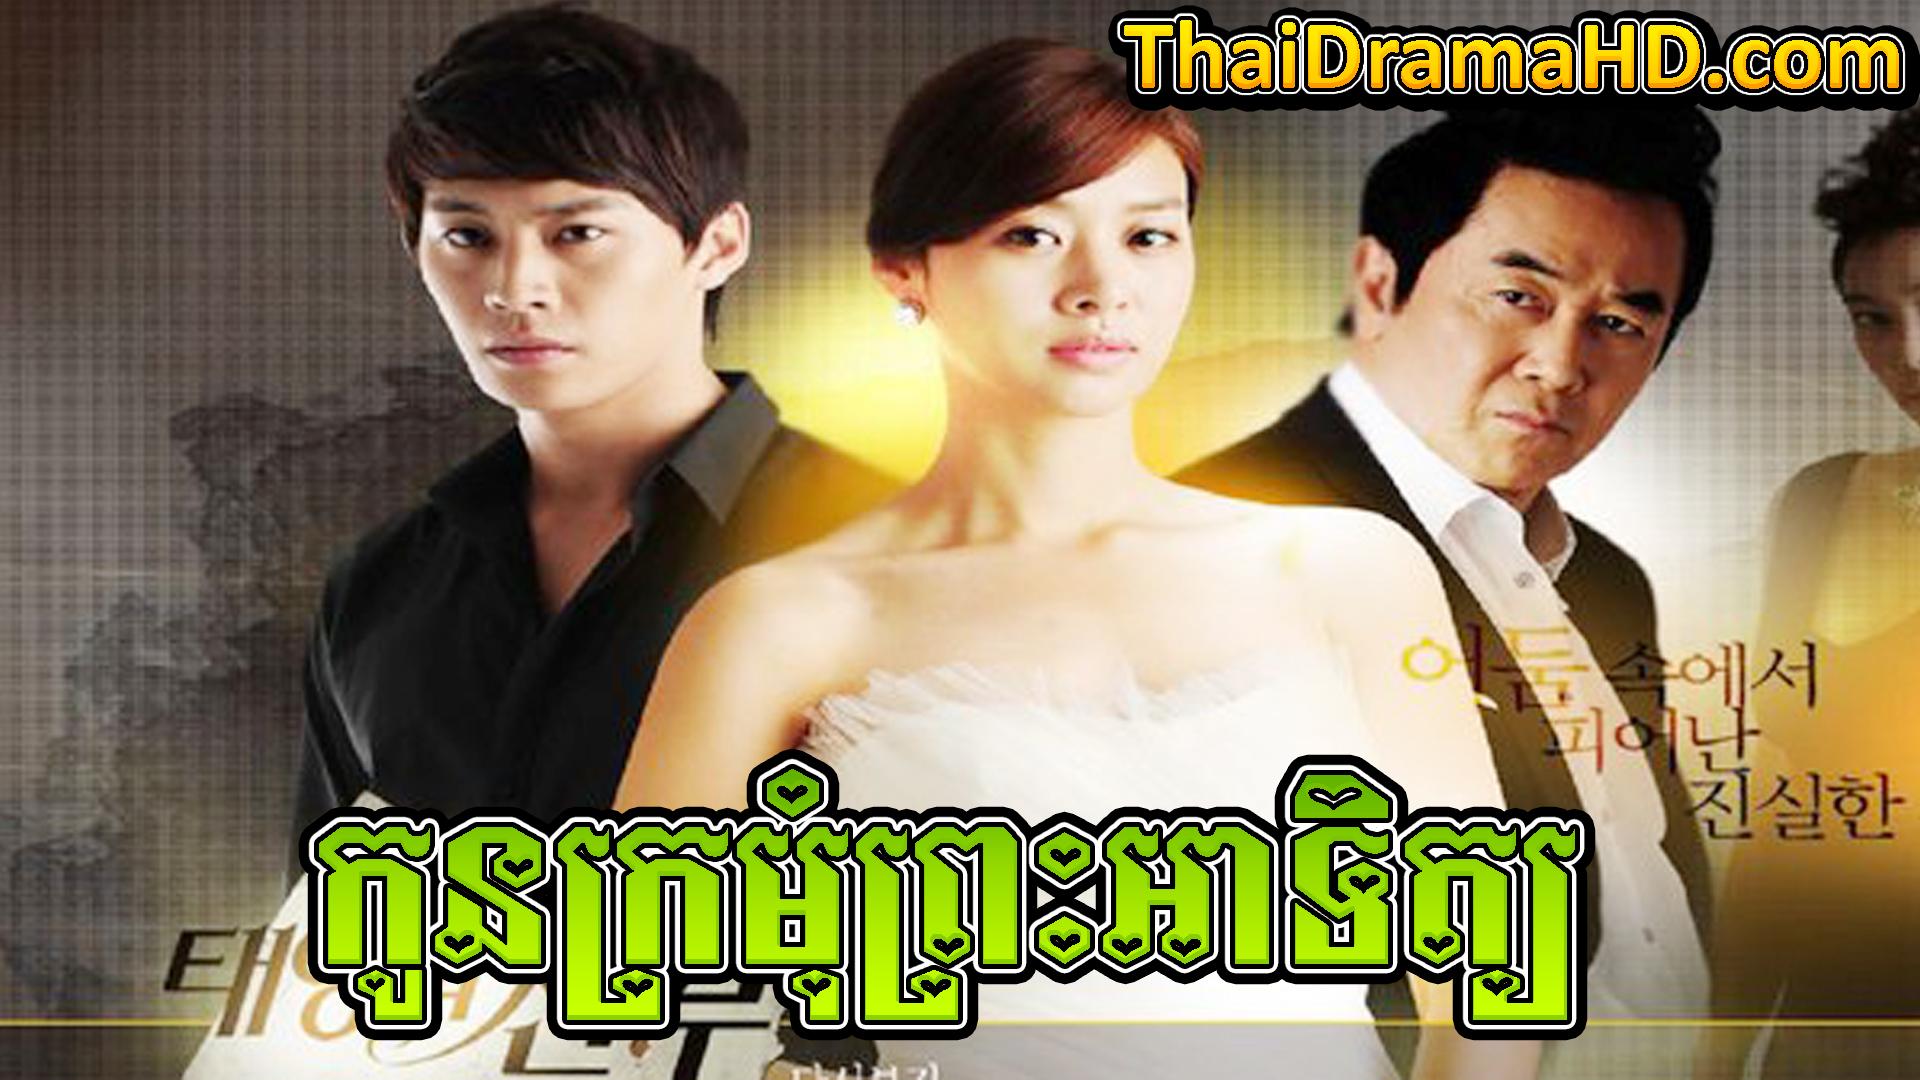 Kon Kramom Preah Atit   Thai Drama   Khmer Movie   Phumikhmer   movie-khmer   video4khmer   khmotions   kolabkhmer   khmer drama   ksdrama   cookingtips   roscheat   khmertimeskh   khmerkomsan   phumi7   merlkon   film2us   movie2kh   sweetdrama   khmercitylove   khreplay   tvb cambodia drama   ckh7   srokthai   phumimedia   phumi8   khmer avenue   khmer search   Soyo   khmerfans